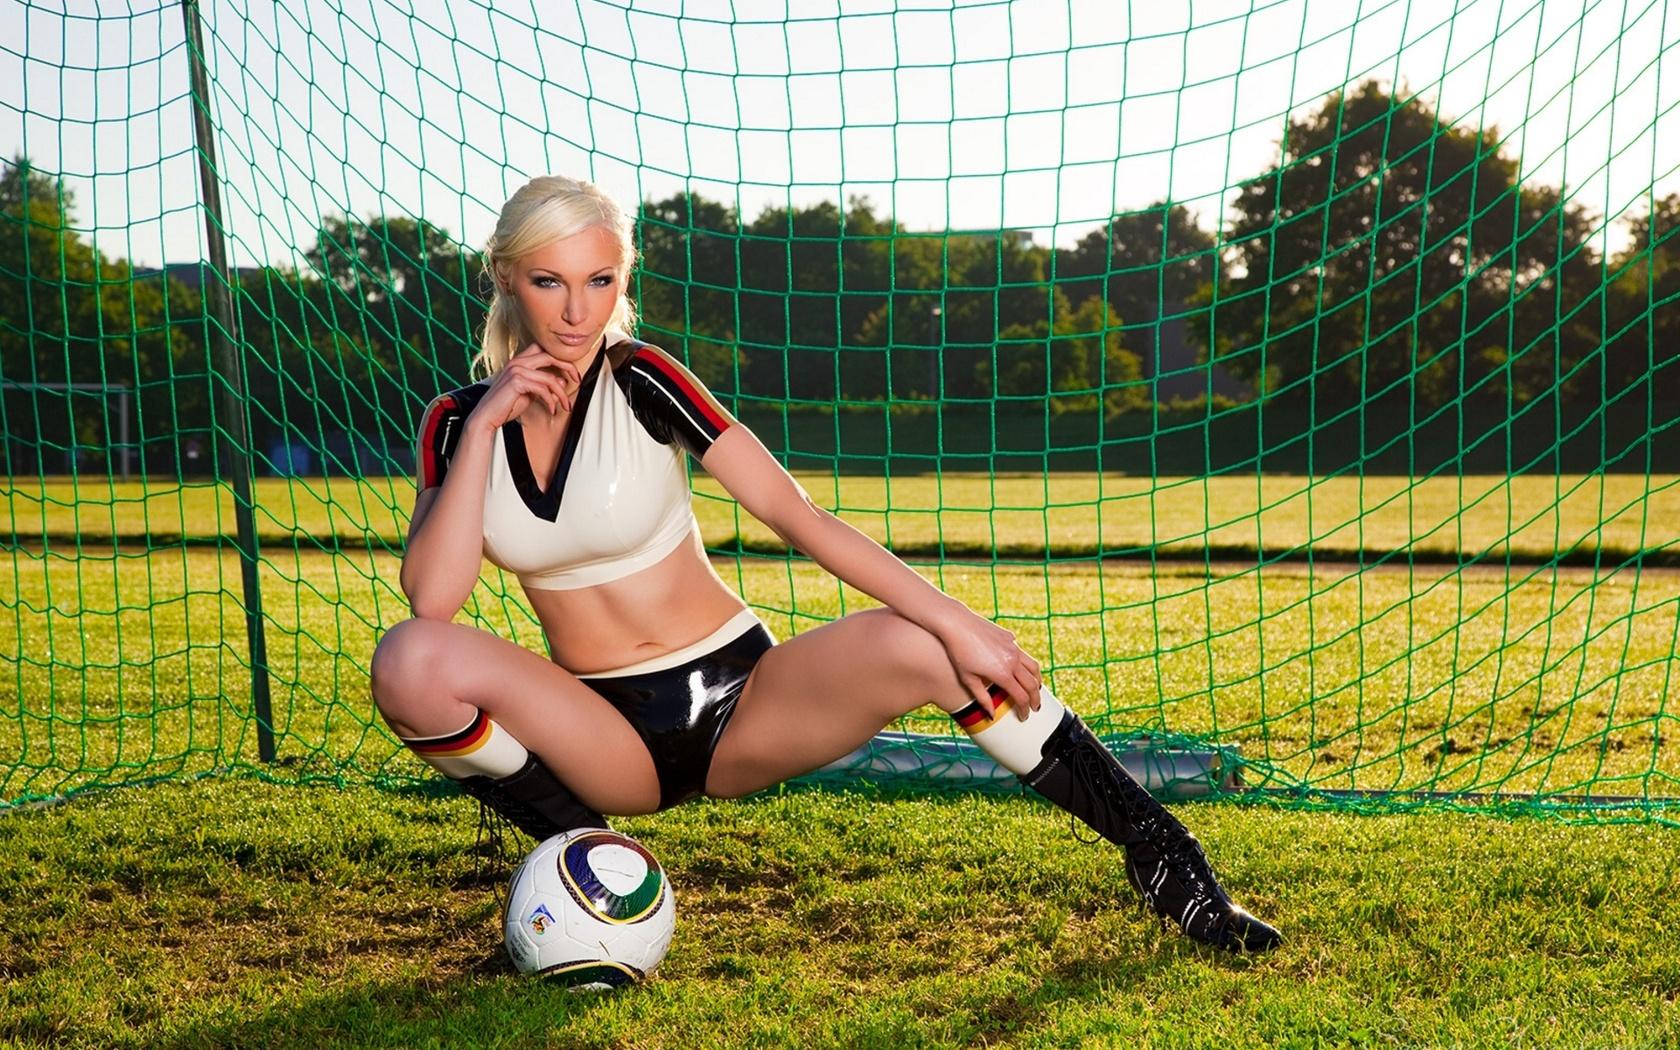 Эро мини игры про футбол